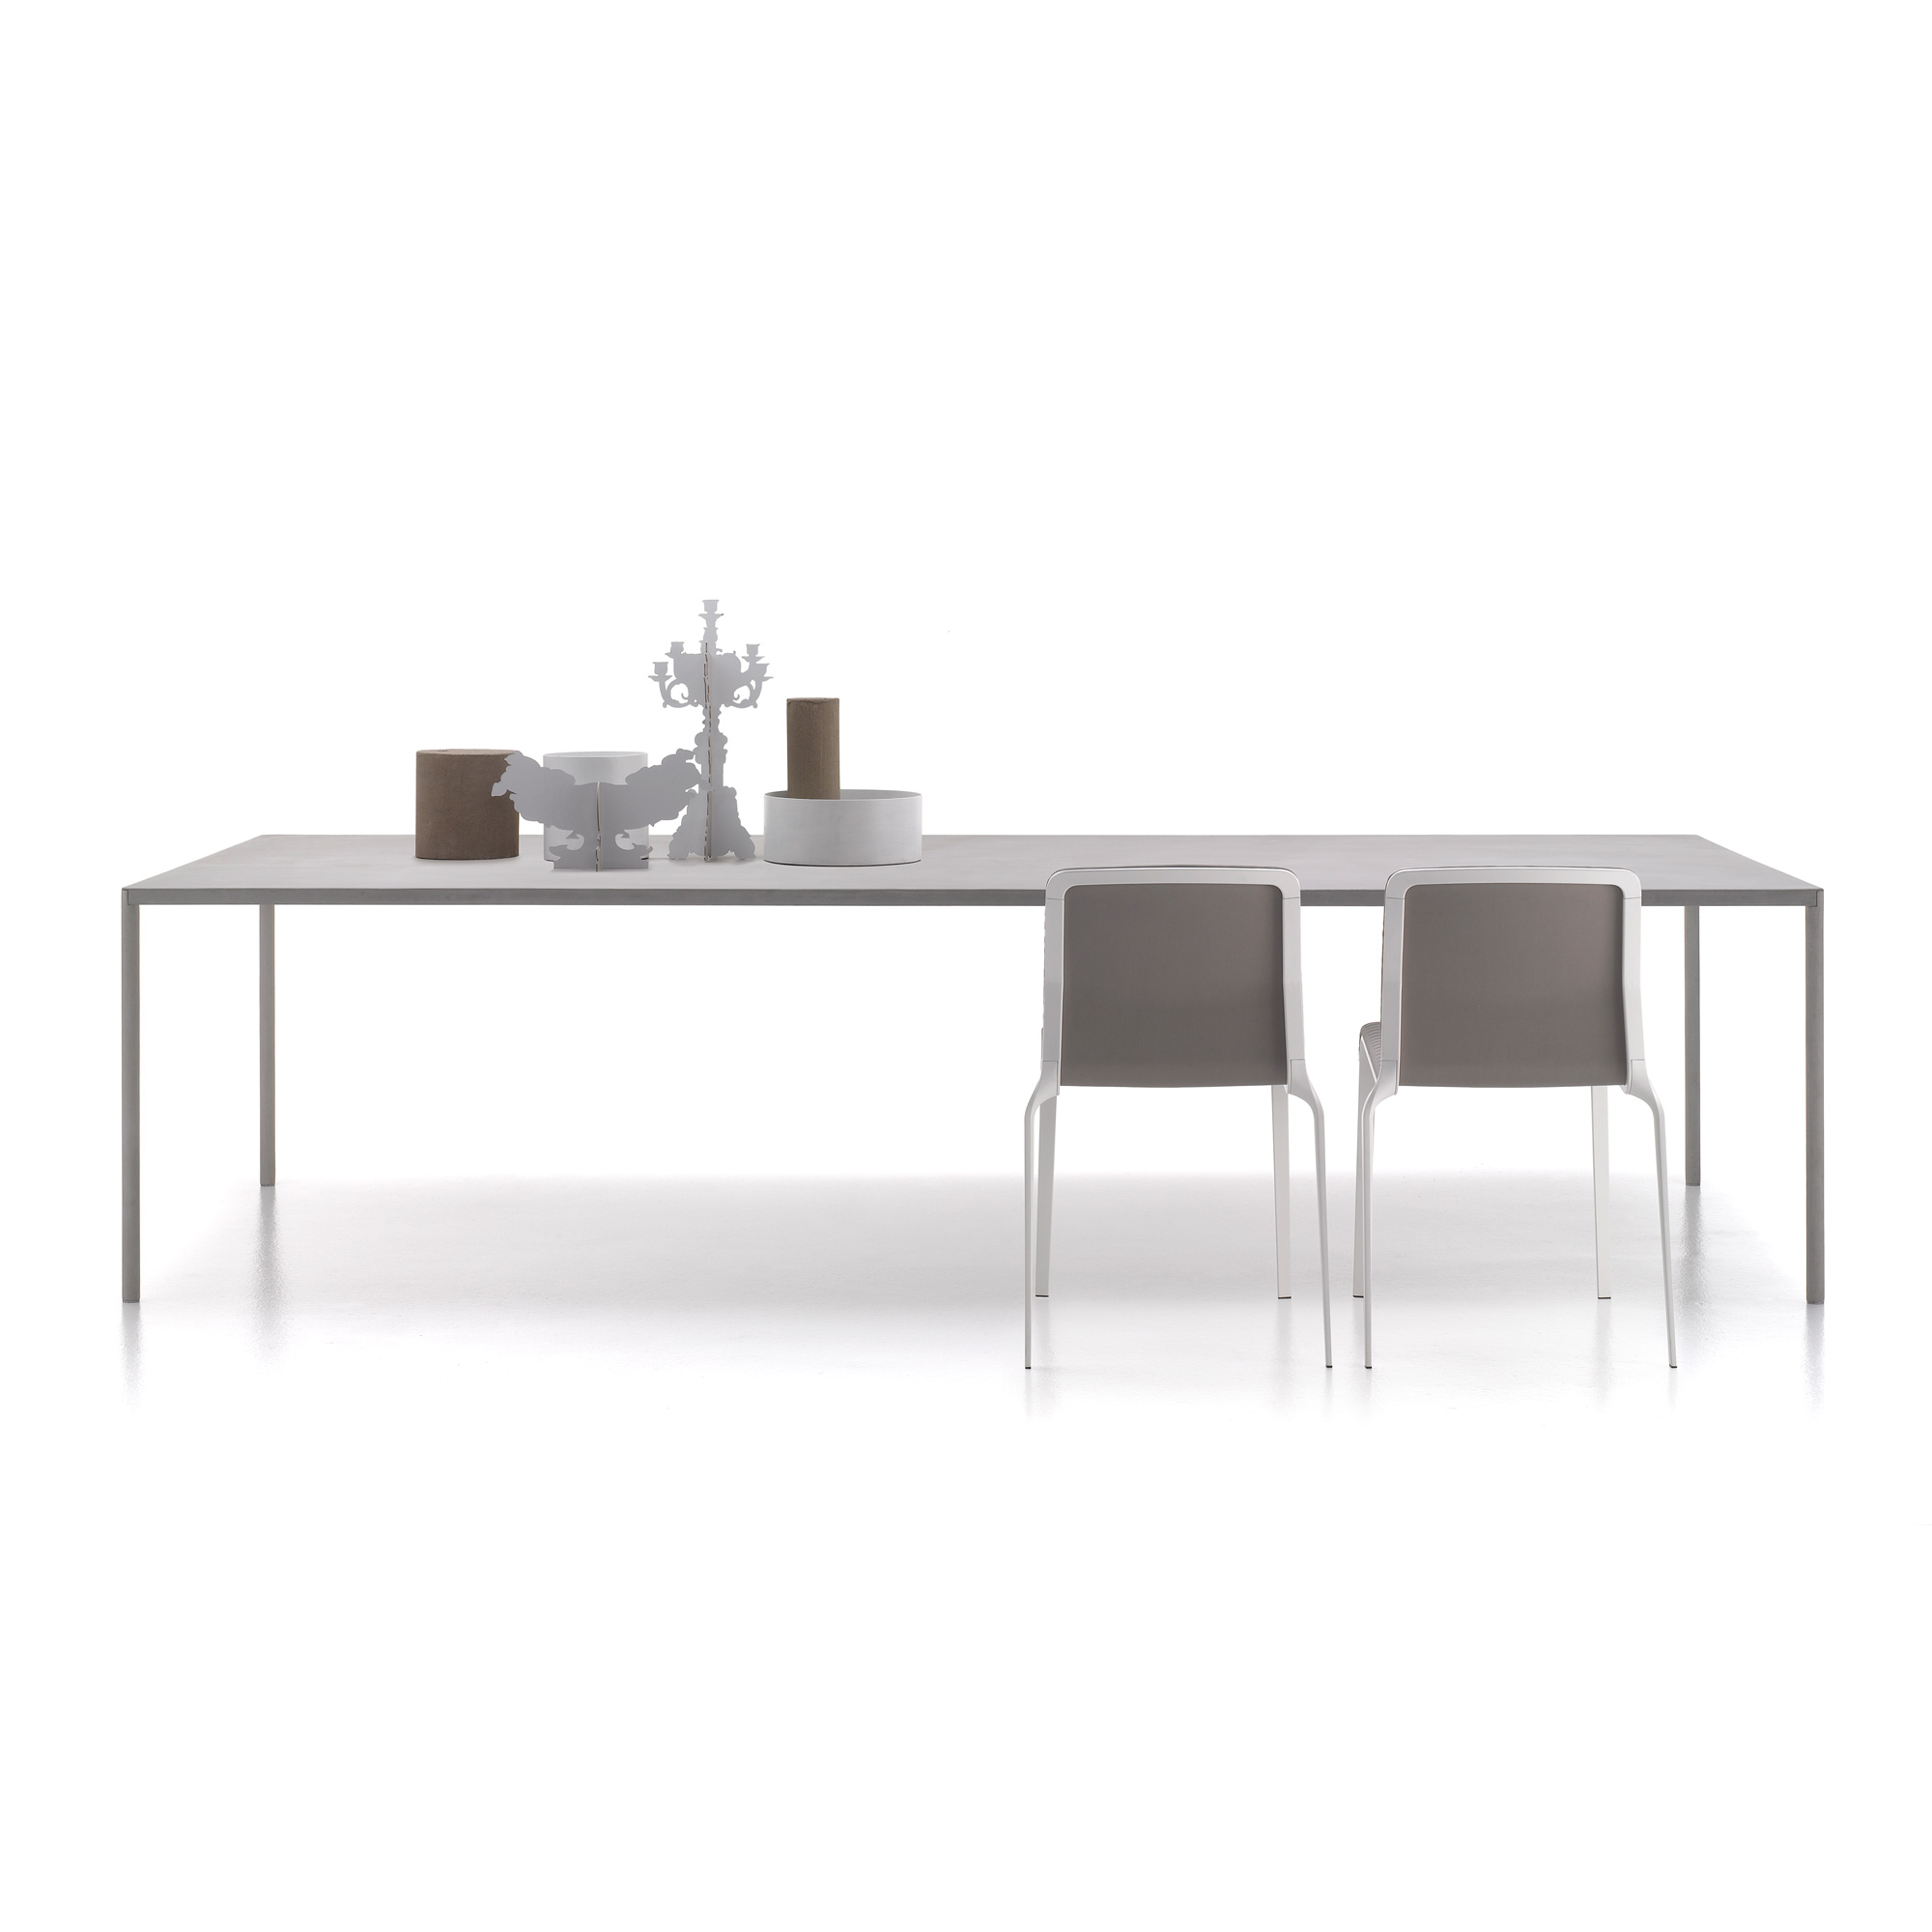 mdf italia robin tisch f043501bp061d036s036 reuter onlineshop. Black Bedroom Furniture Sets. Home Design Ideas